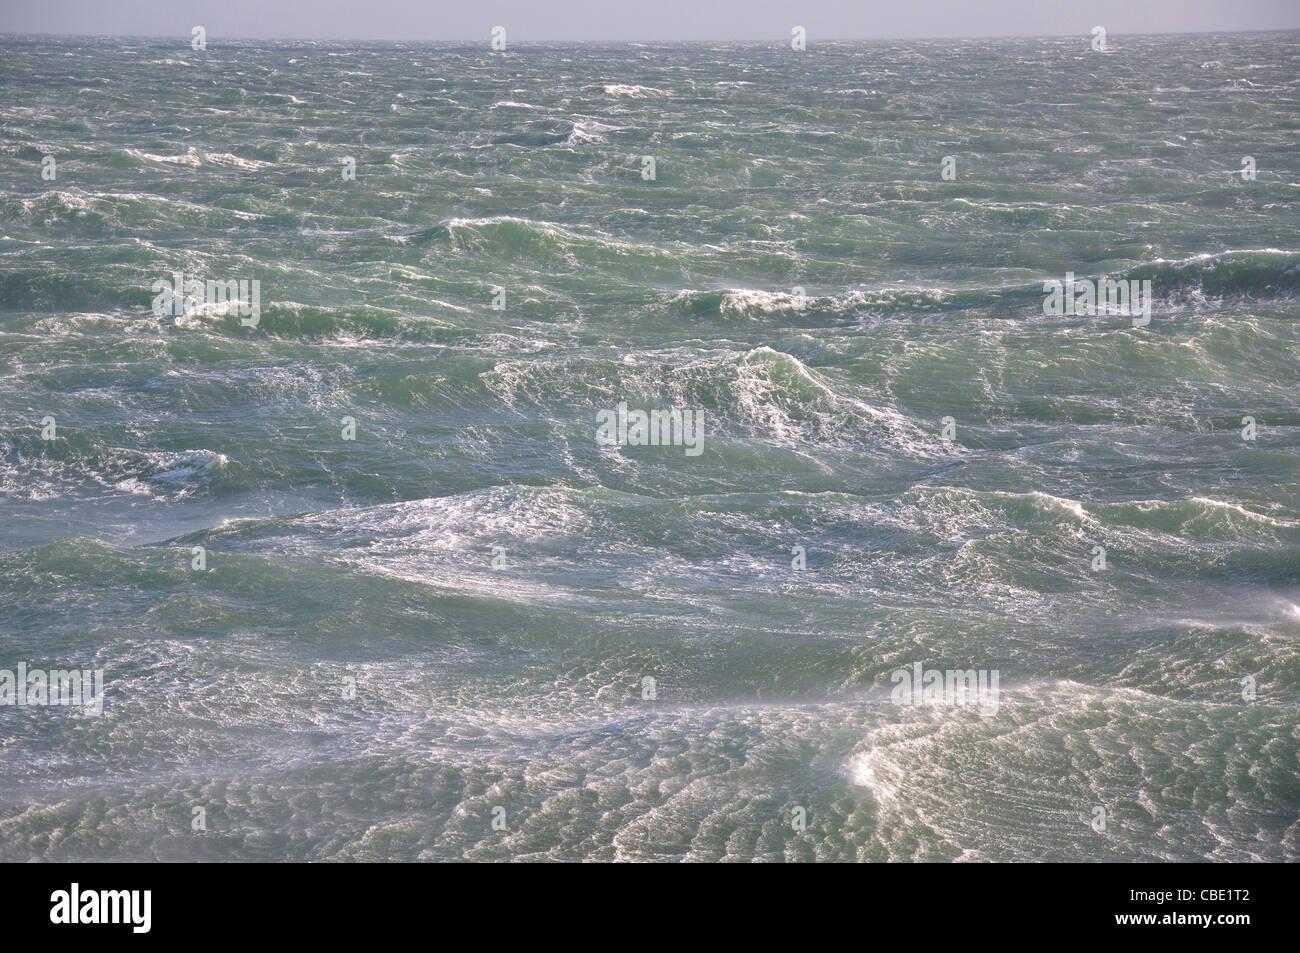 Raue See und Spray, Nordsee, Europa Stockbild